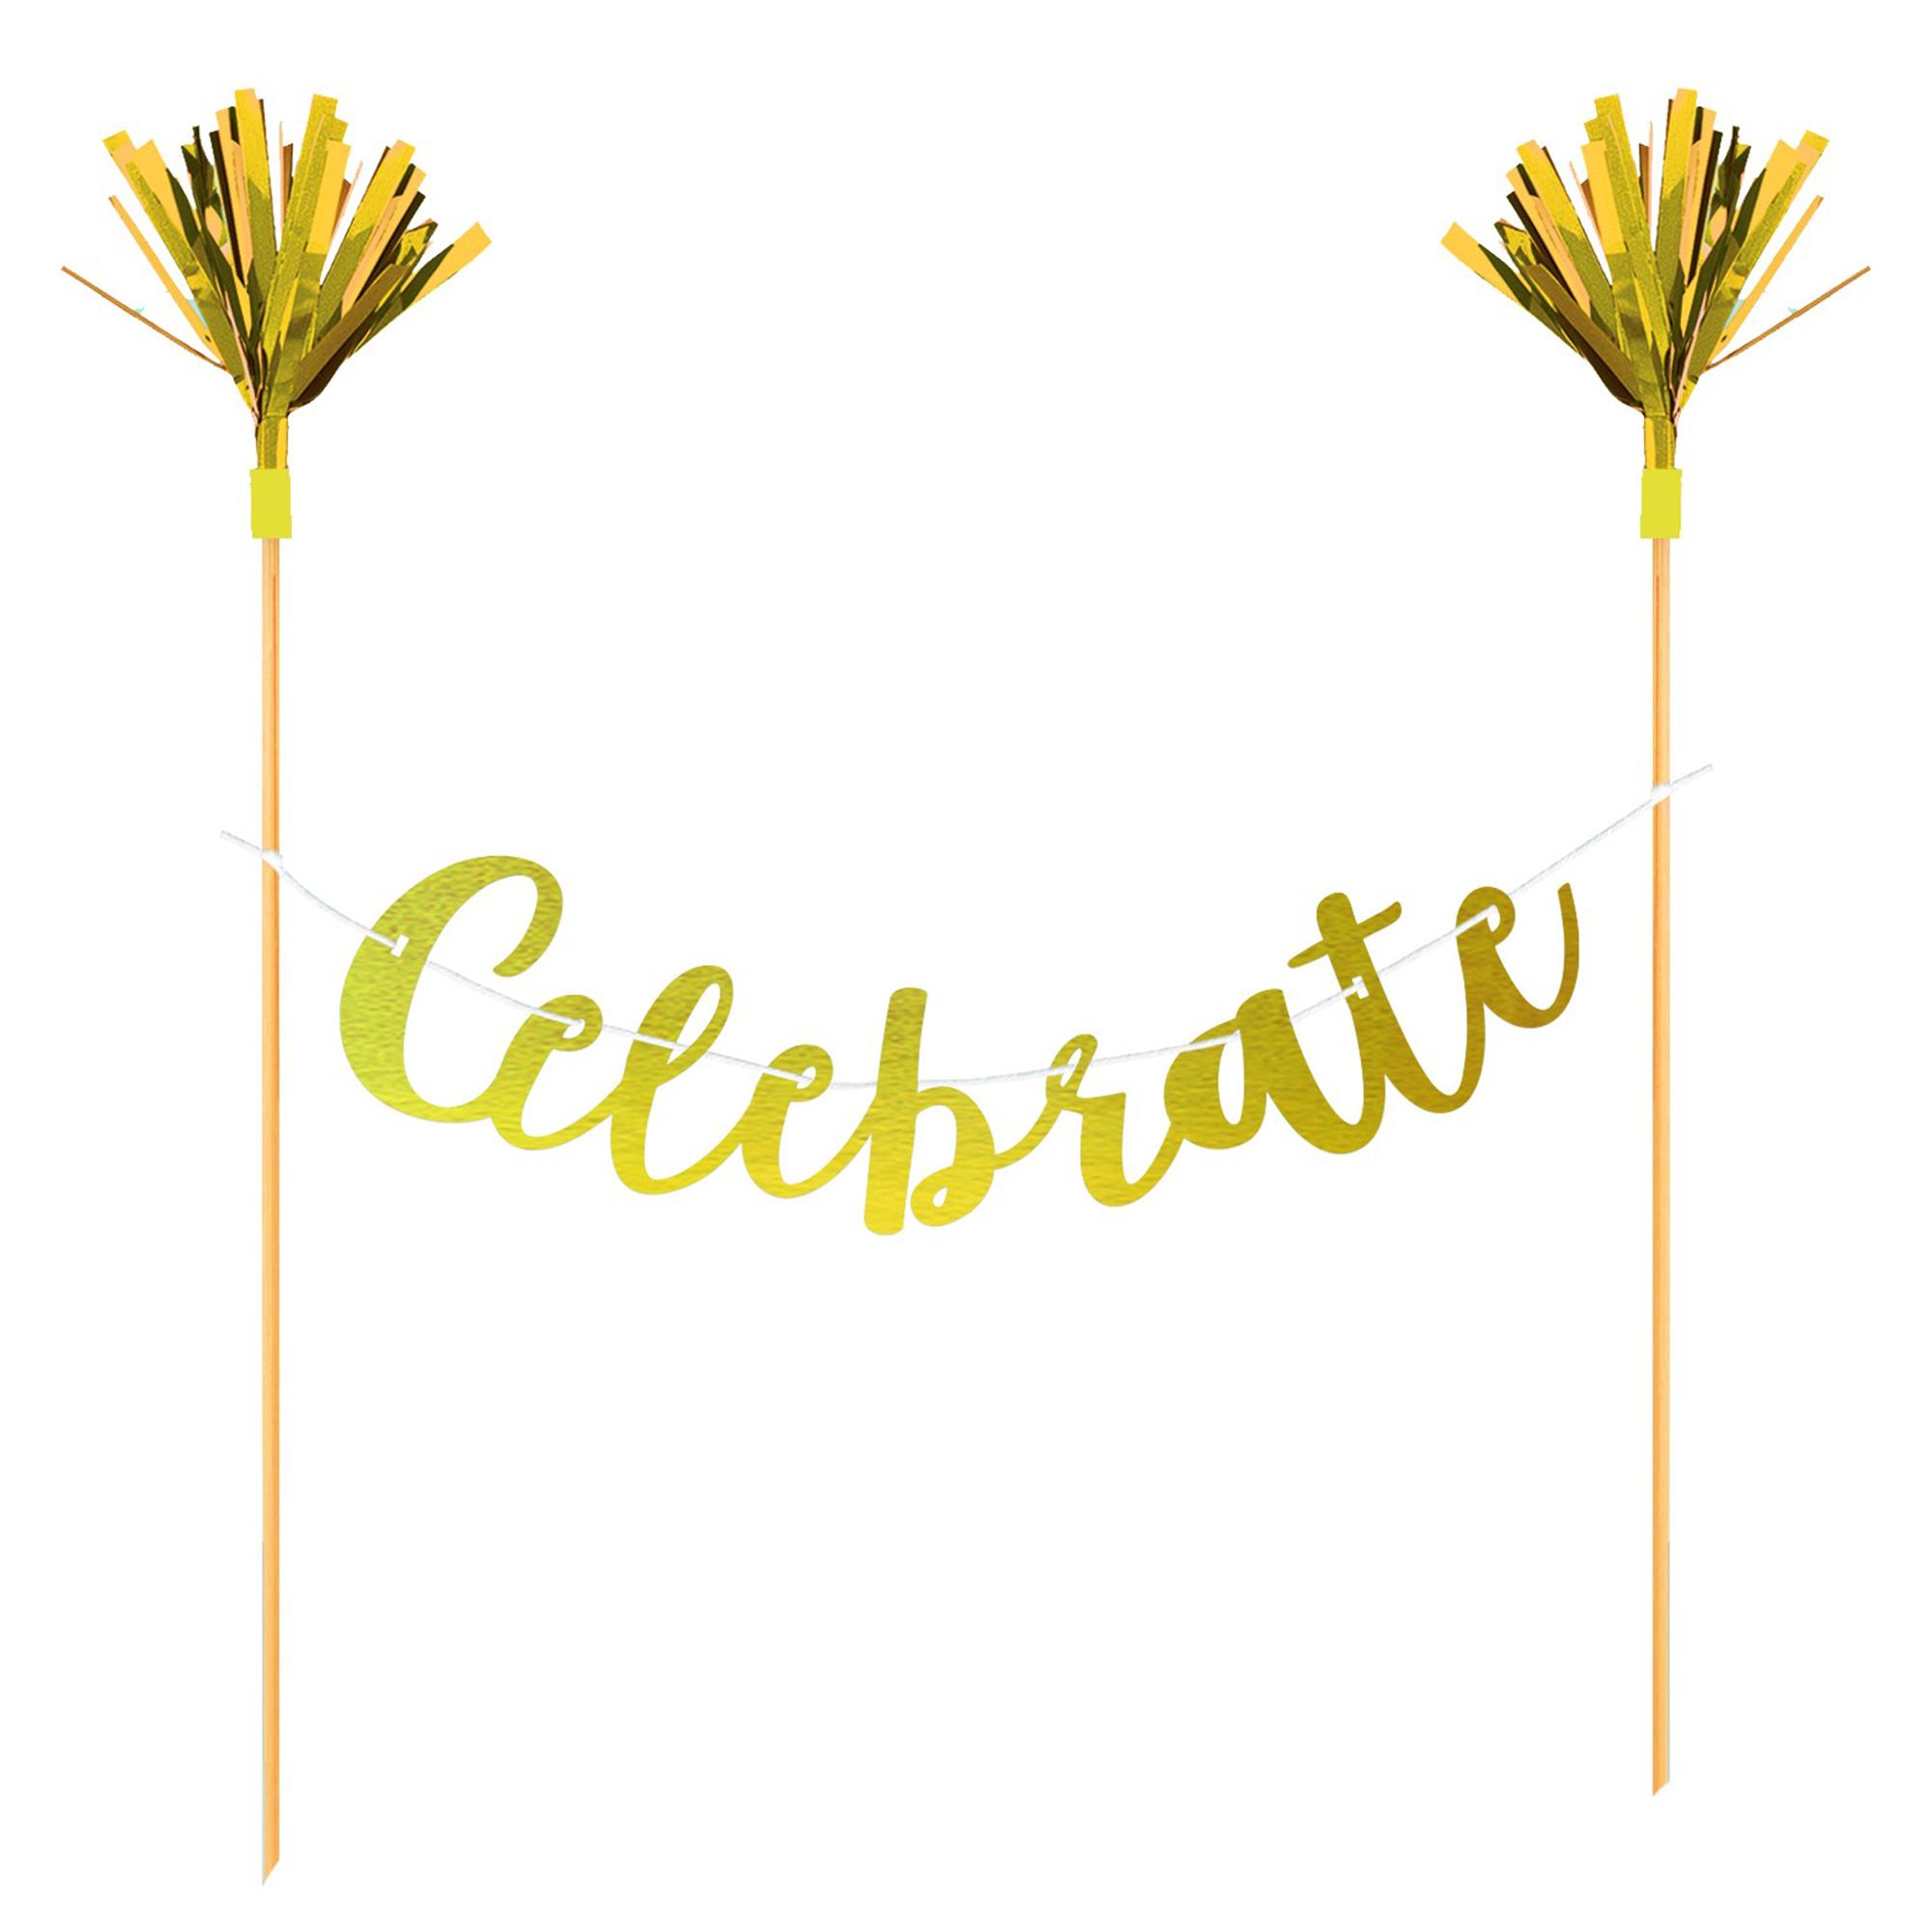 Cake Banner Topper Celebrate Gold Foil & Wooden Picks